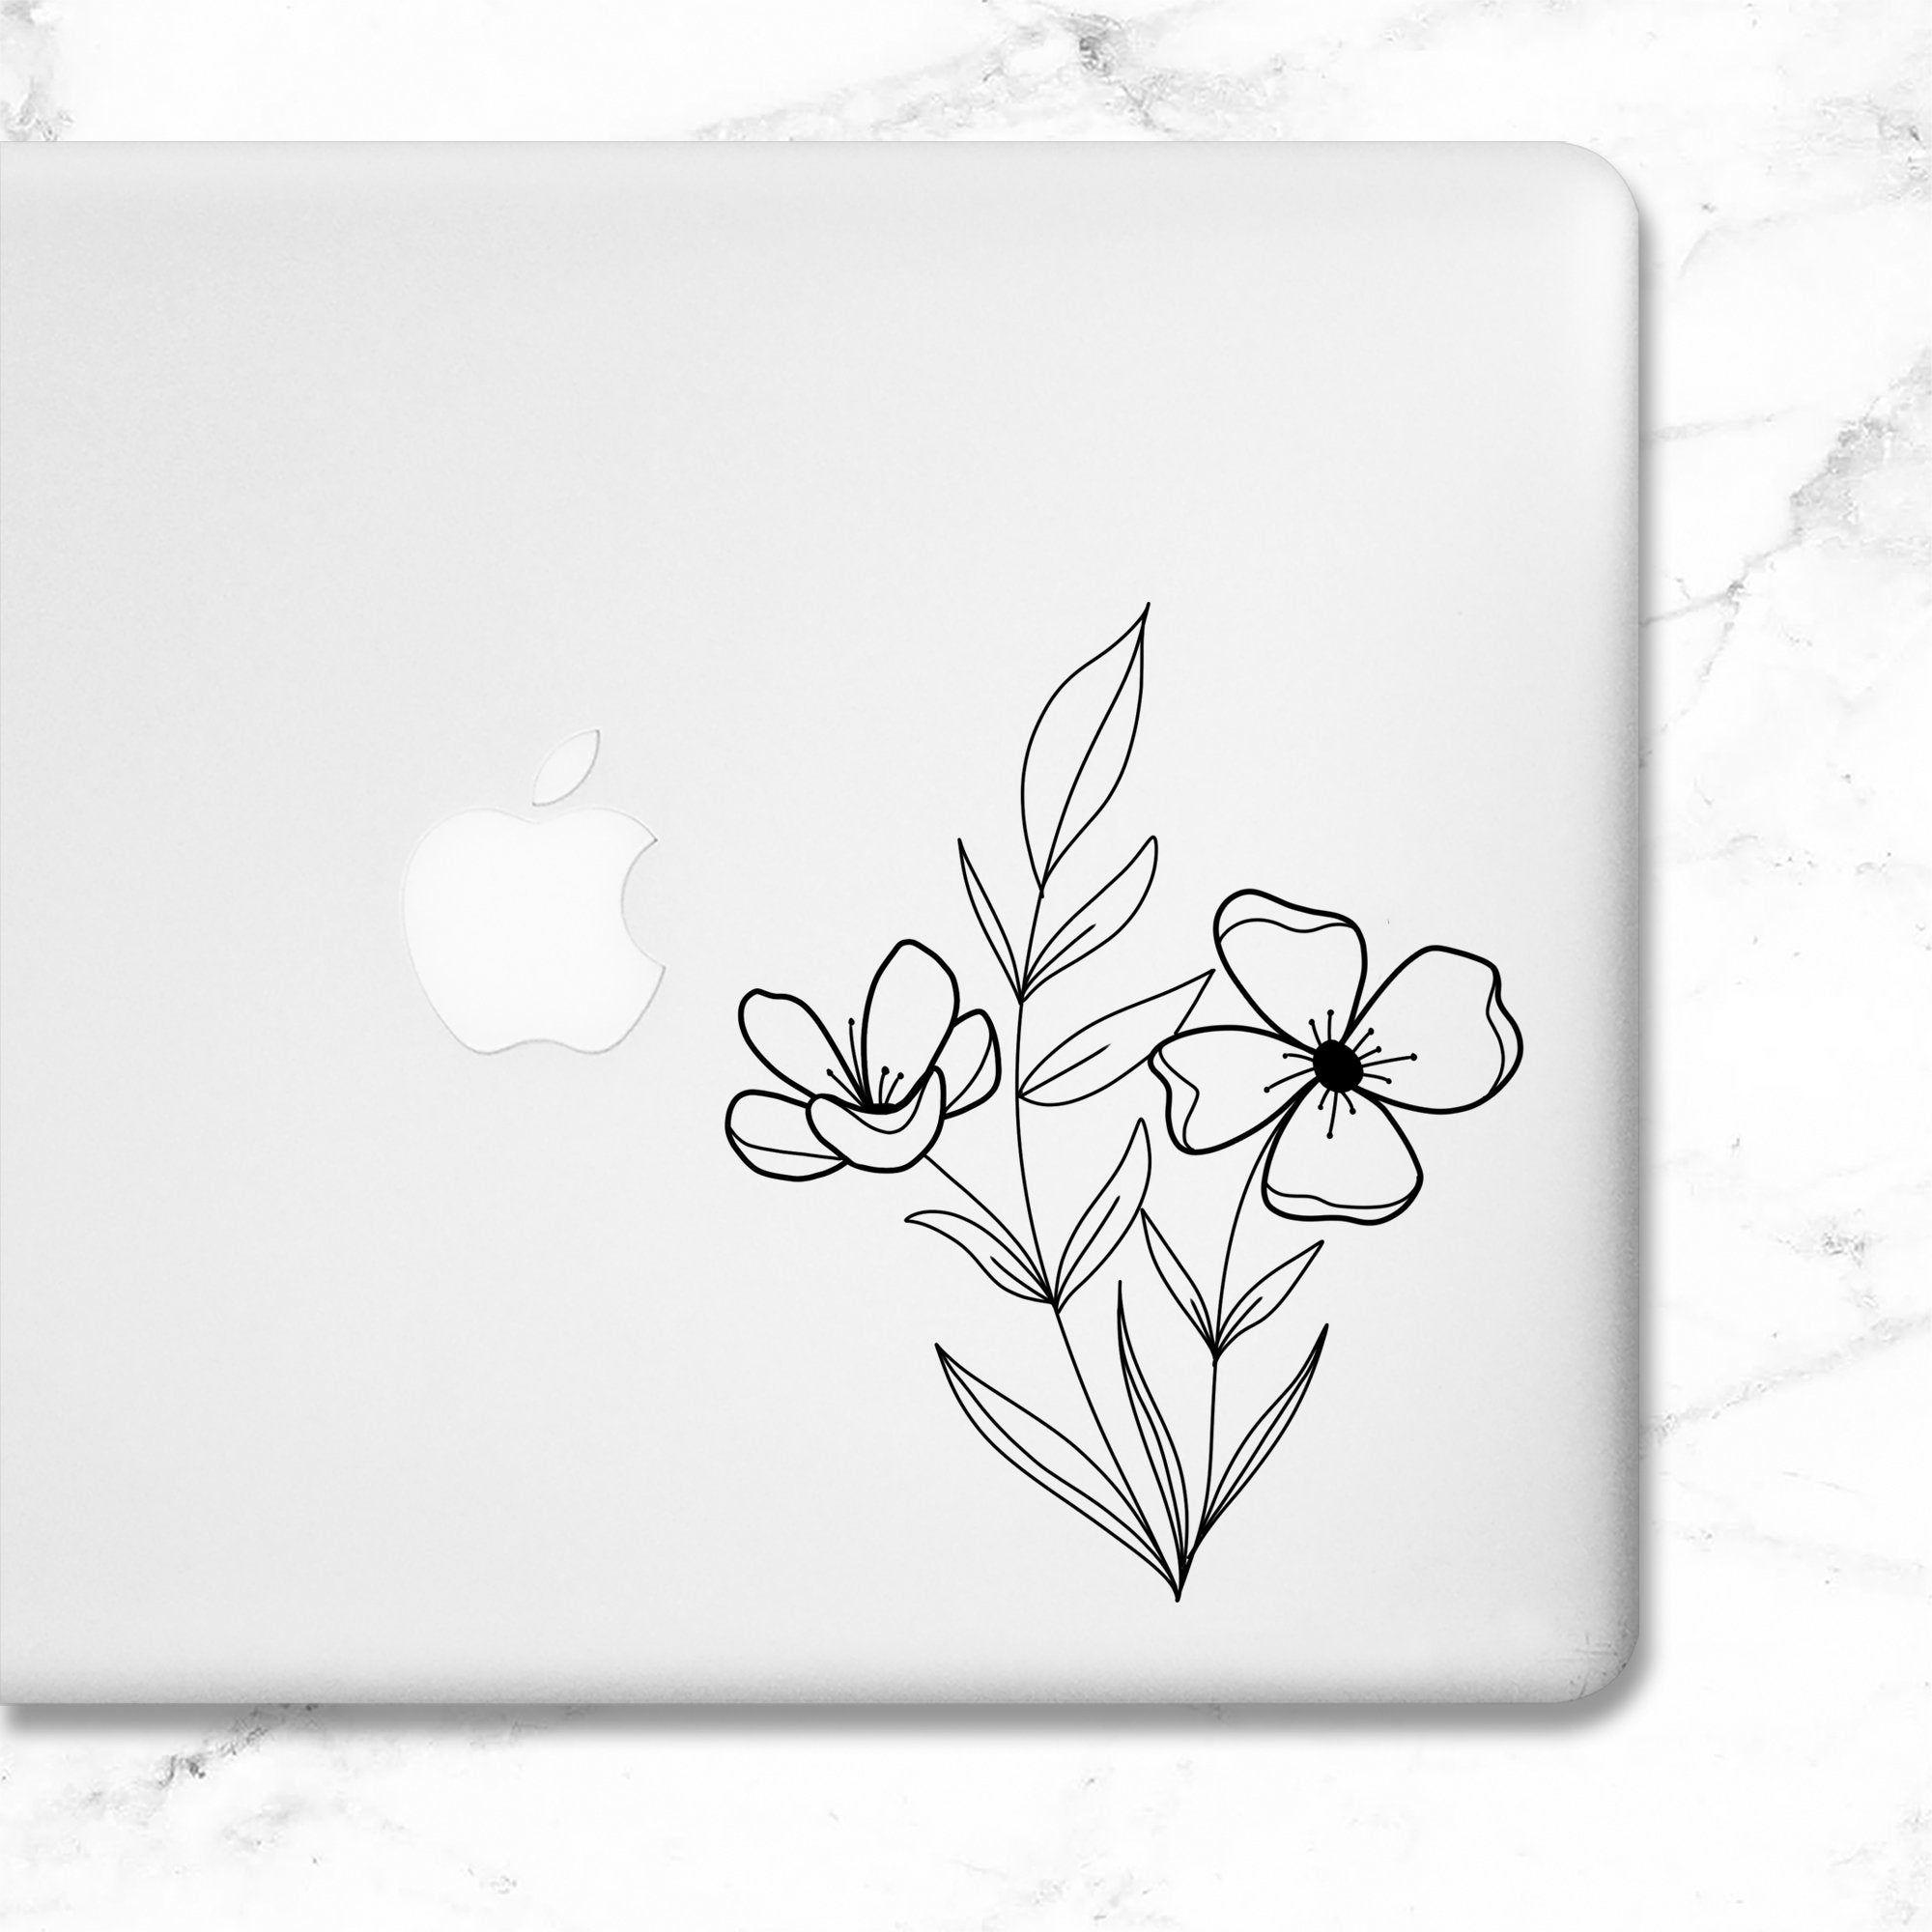 Vinyl Decal Flowers Vinyl Decal Flower Sticker Laptop Sticker Floral Decal Flower Vinyl Floral Decal Monogram Vinyl Decal Macbook Decal Stickers [ 2000 x 2000 Pixel ]